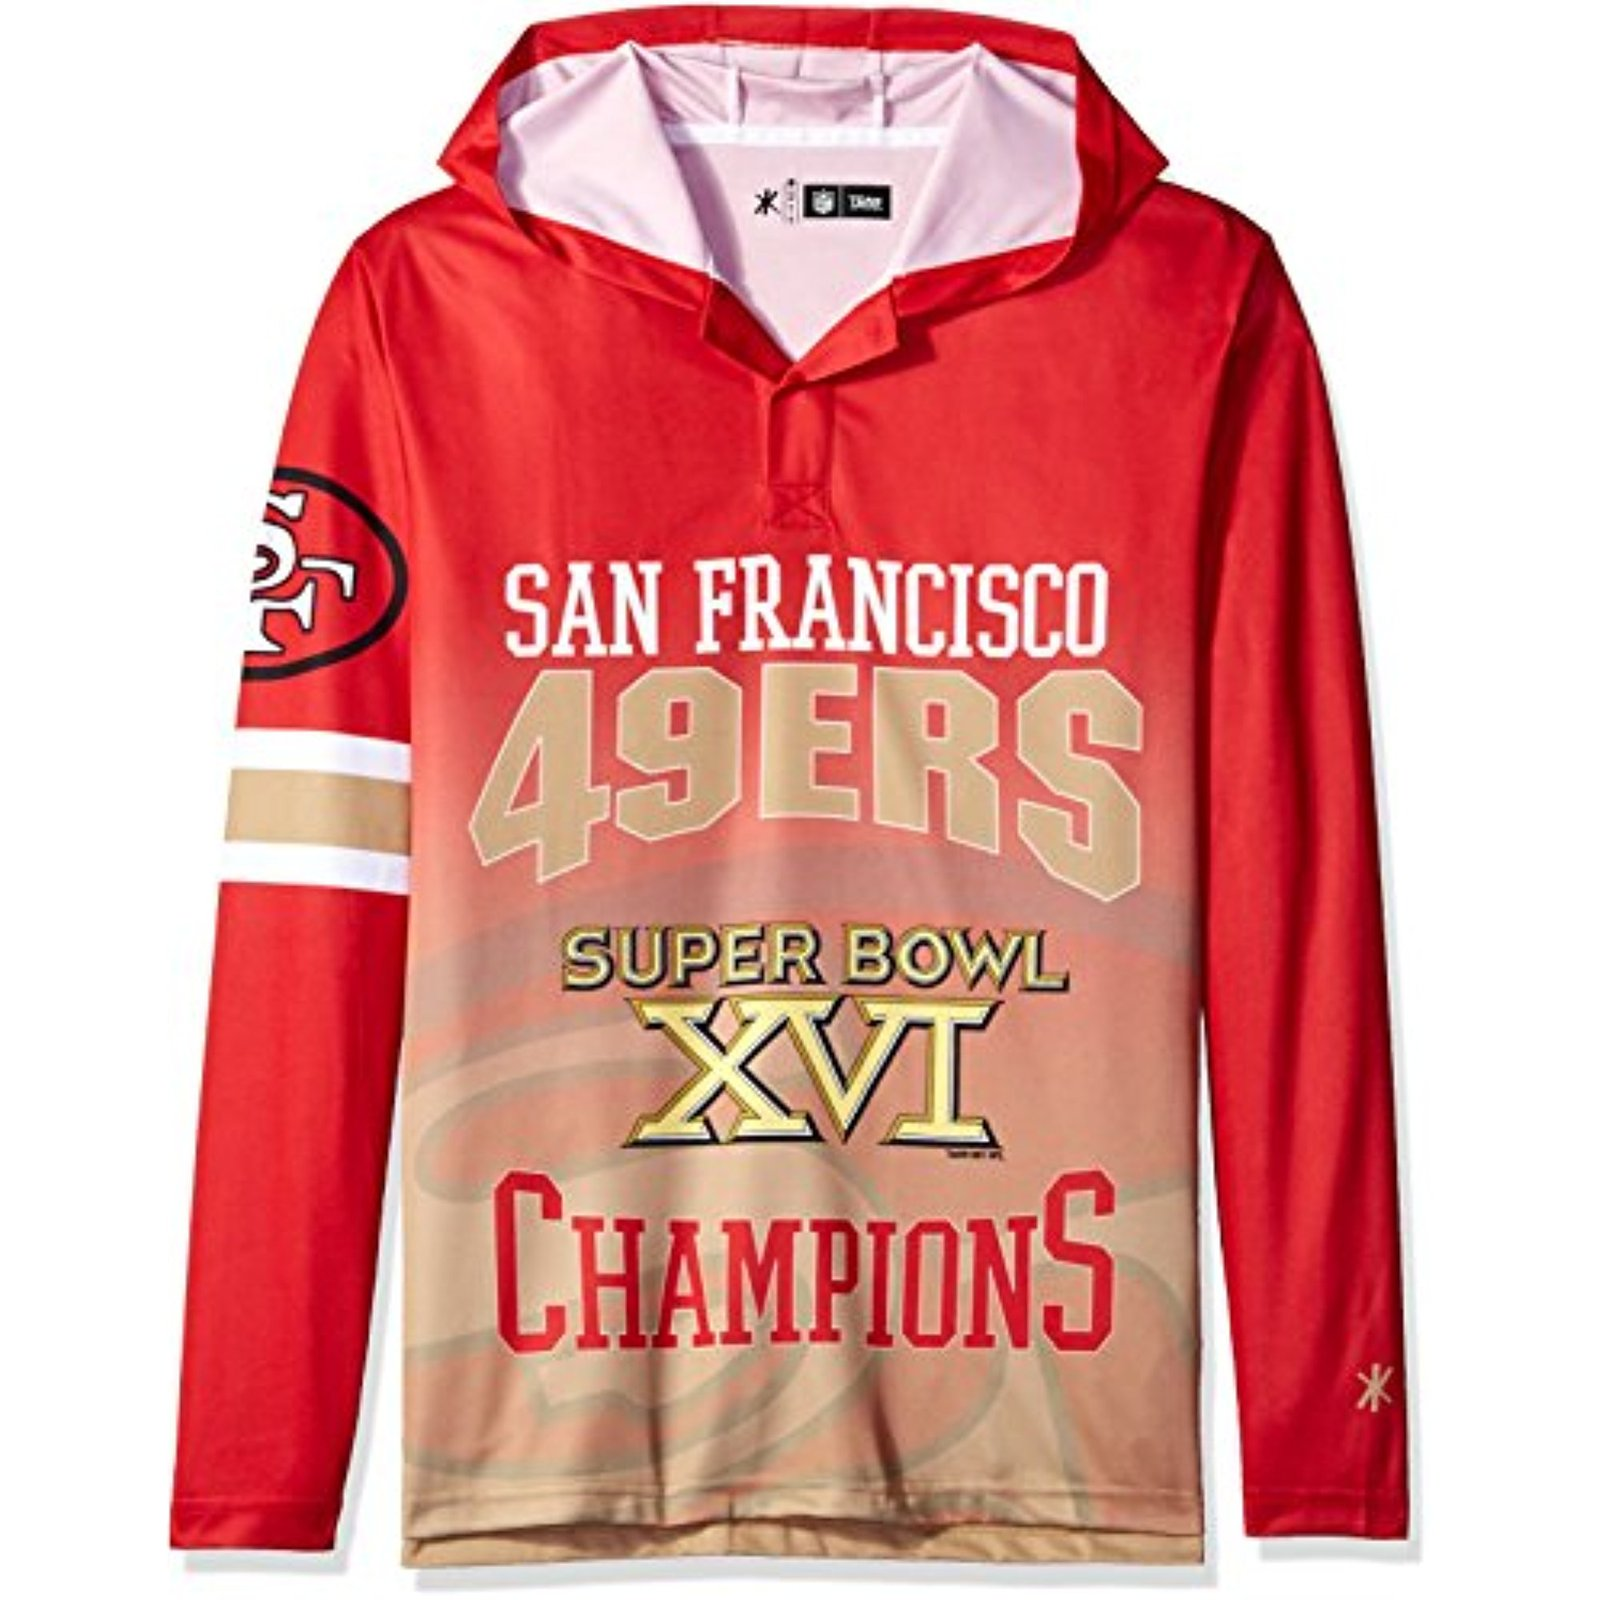 NFL San Francisco 49ers Super Bowl XVI Champions Hoody Tee, Medium